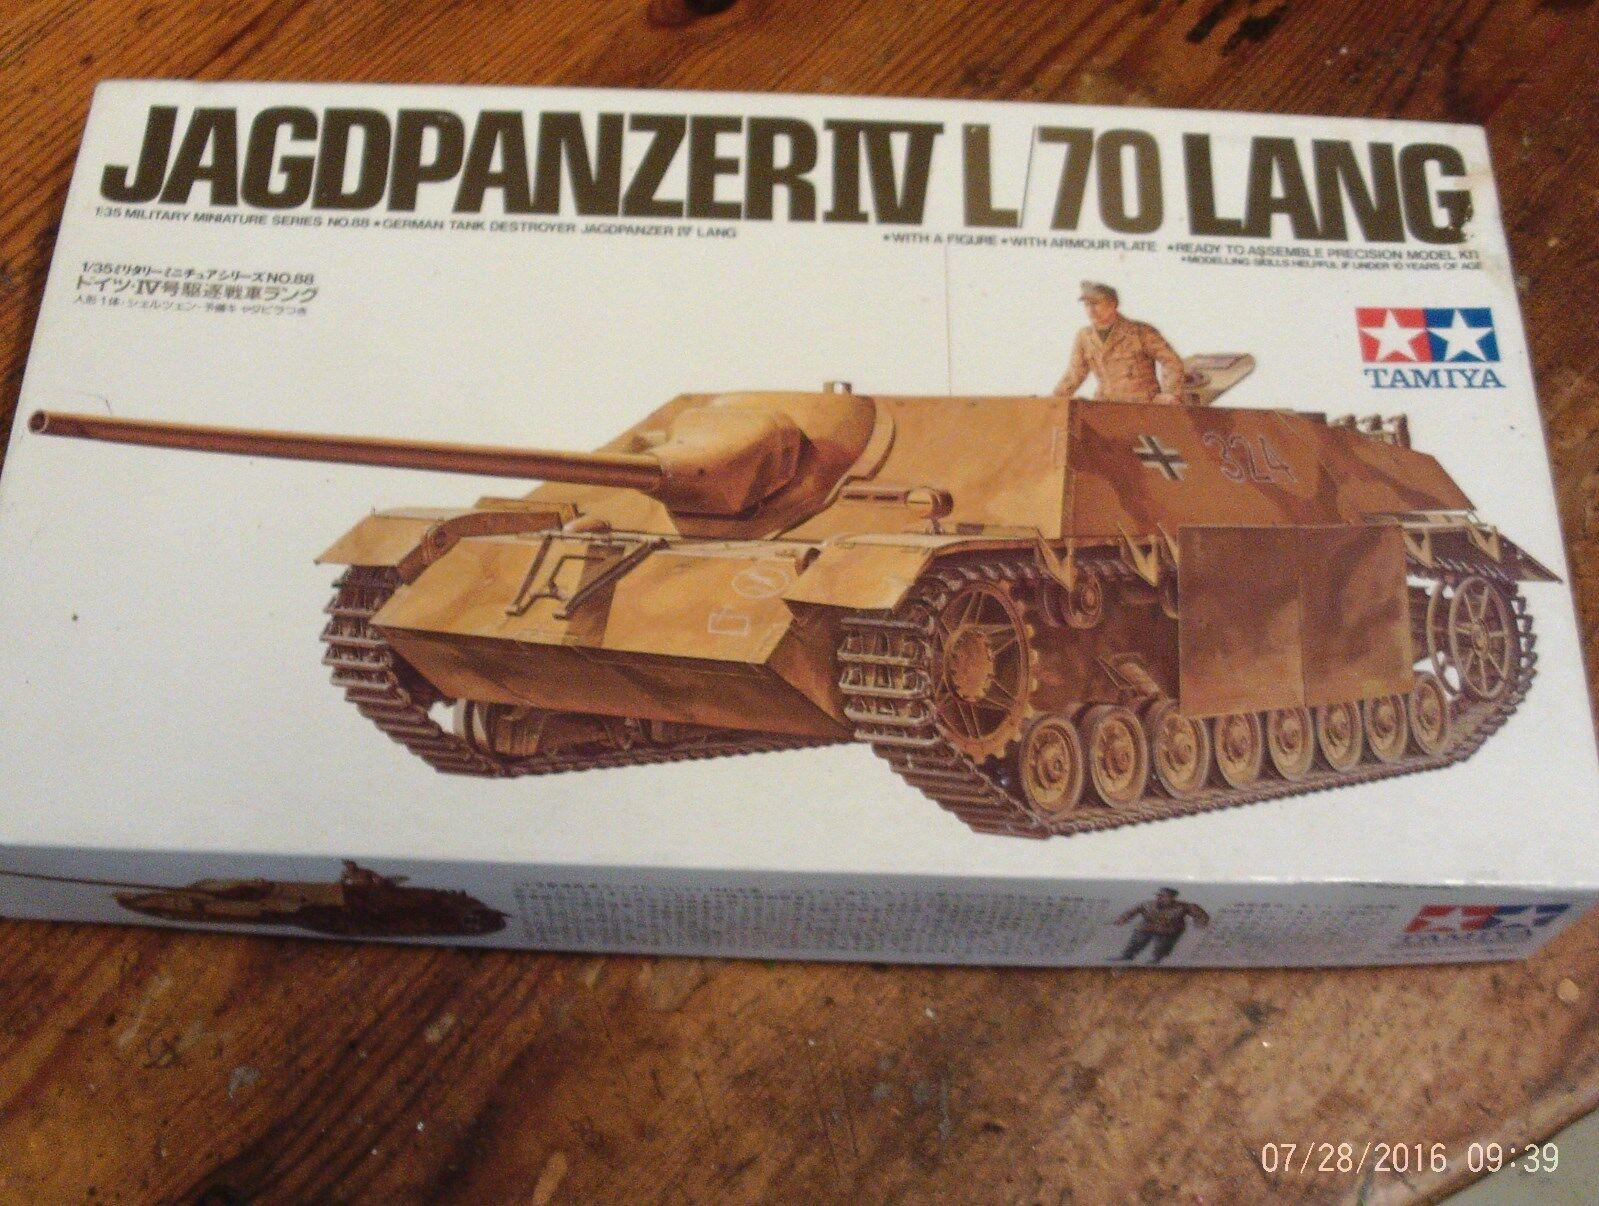 VINTAGE 1970S TAMIYA MODEL KIT WW11 1 35 GERMAN JAGDPANZER IV L 70 LANG.NEW